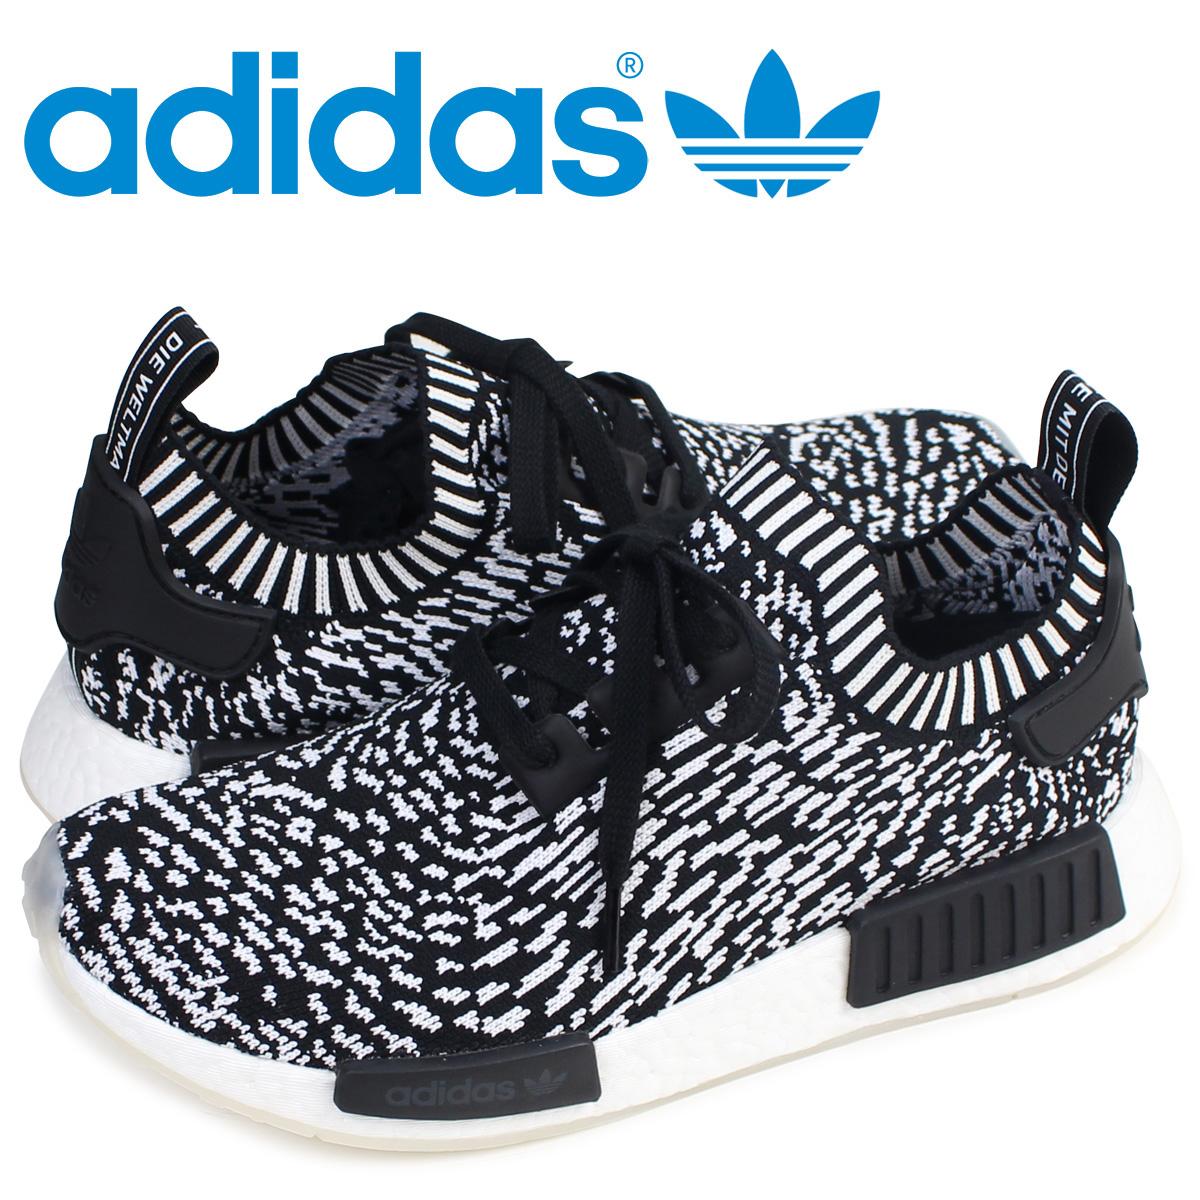 44ed98d65d1d63 adidas NMD R1 PK Adidas originals sneakers N M D nomad men BY3013 ZEBRA  PACK shoes black  8 16 Shinnyu load   178